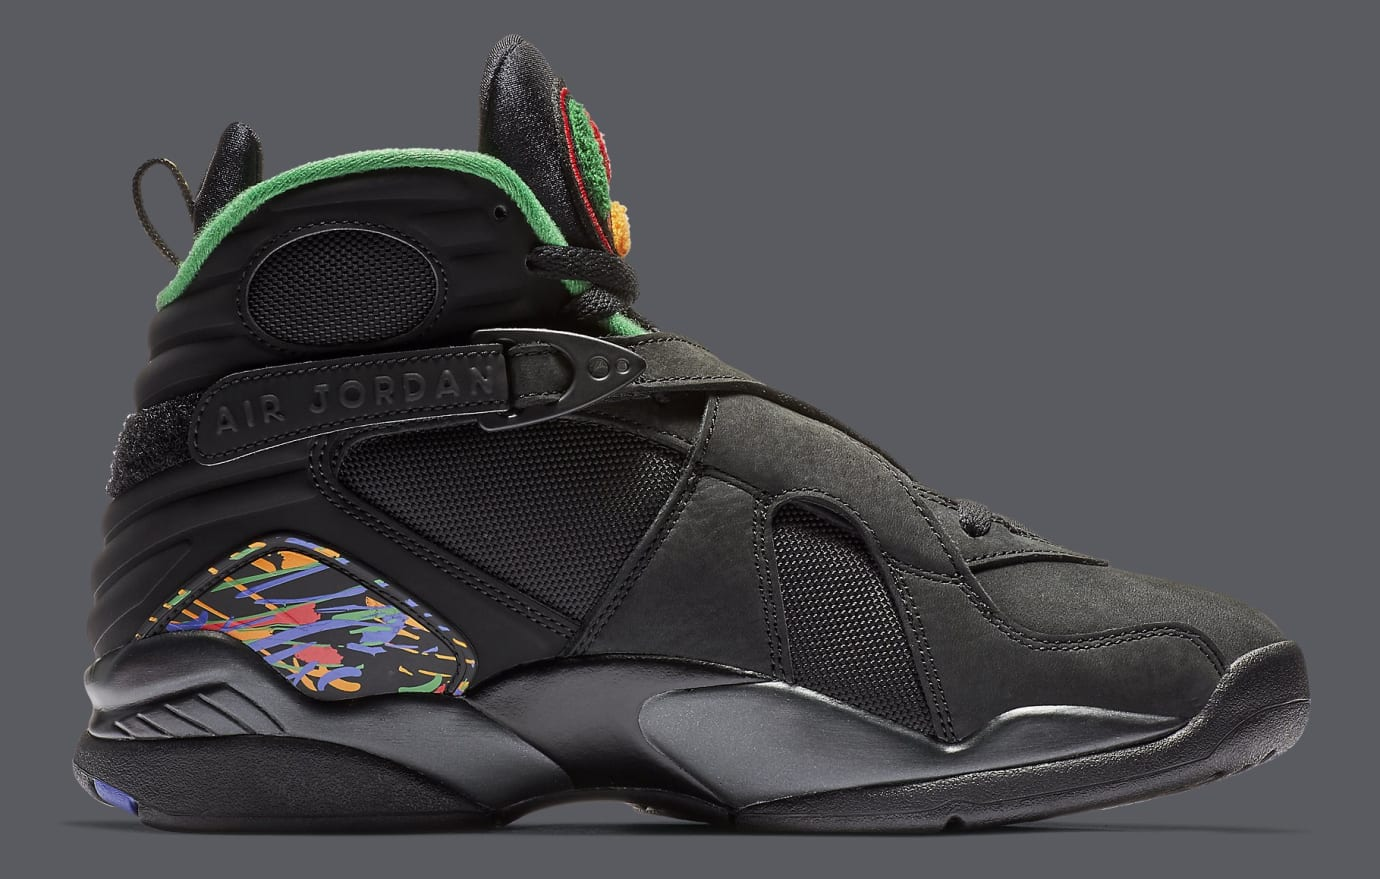 buy online b0ea4 cc0a4 Image via Nike Air Jordan 8 VIII Tinker Air Raid Release Date 305381-004  Medial